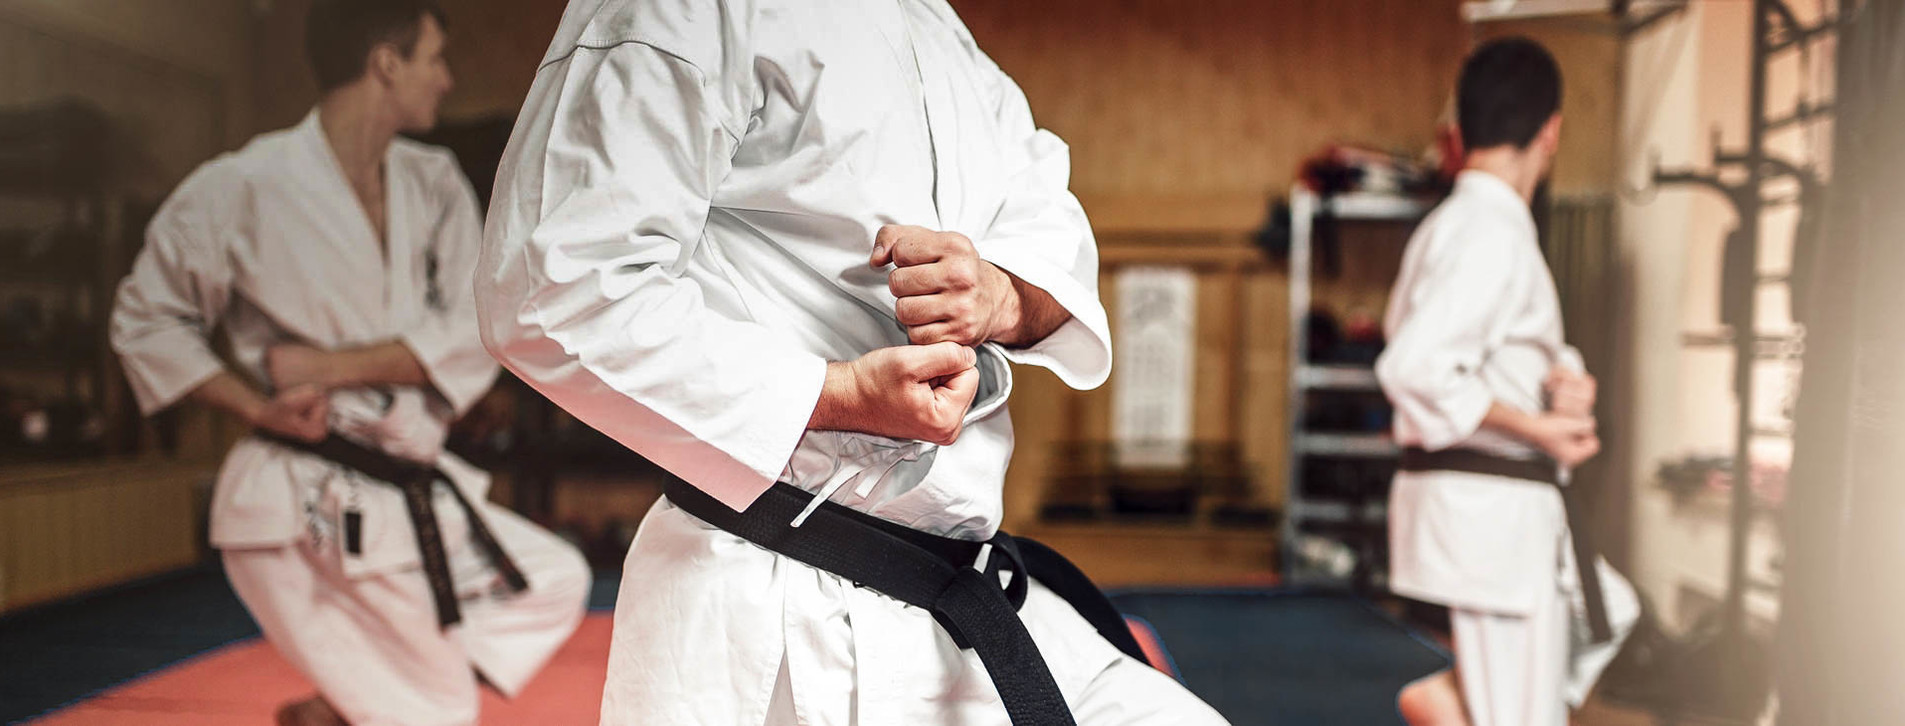 Фото 1 - Курс тренировок по дзюдо